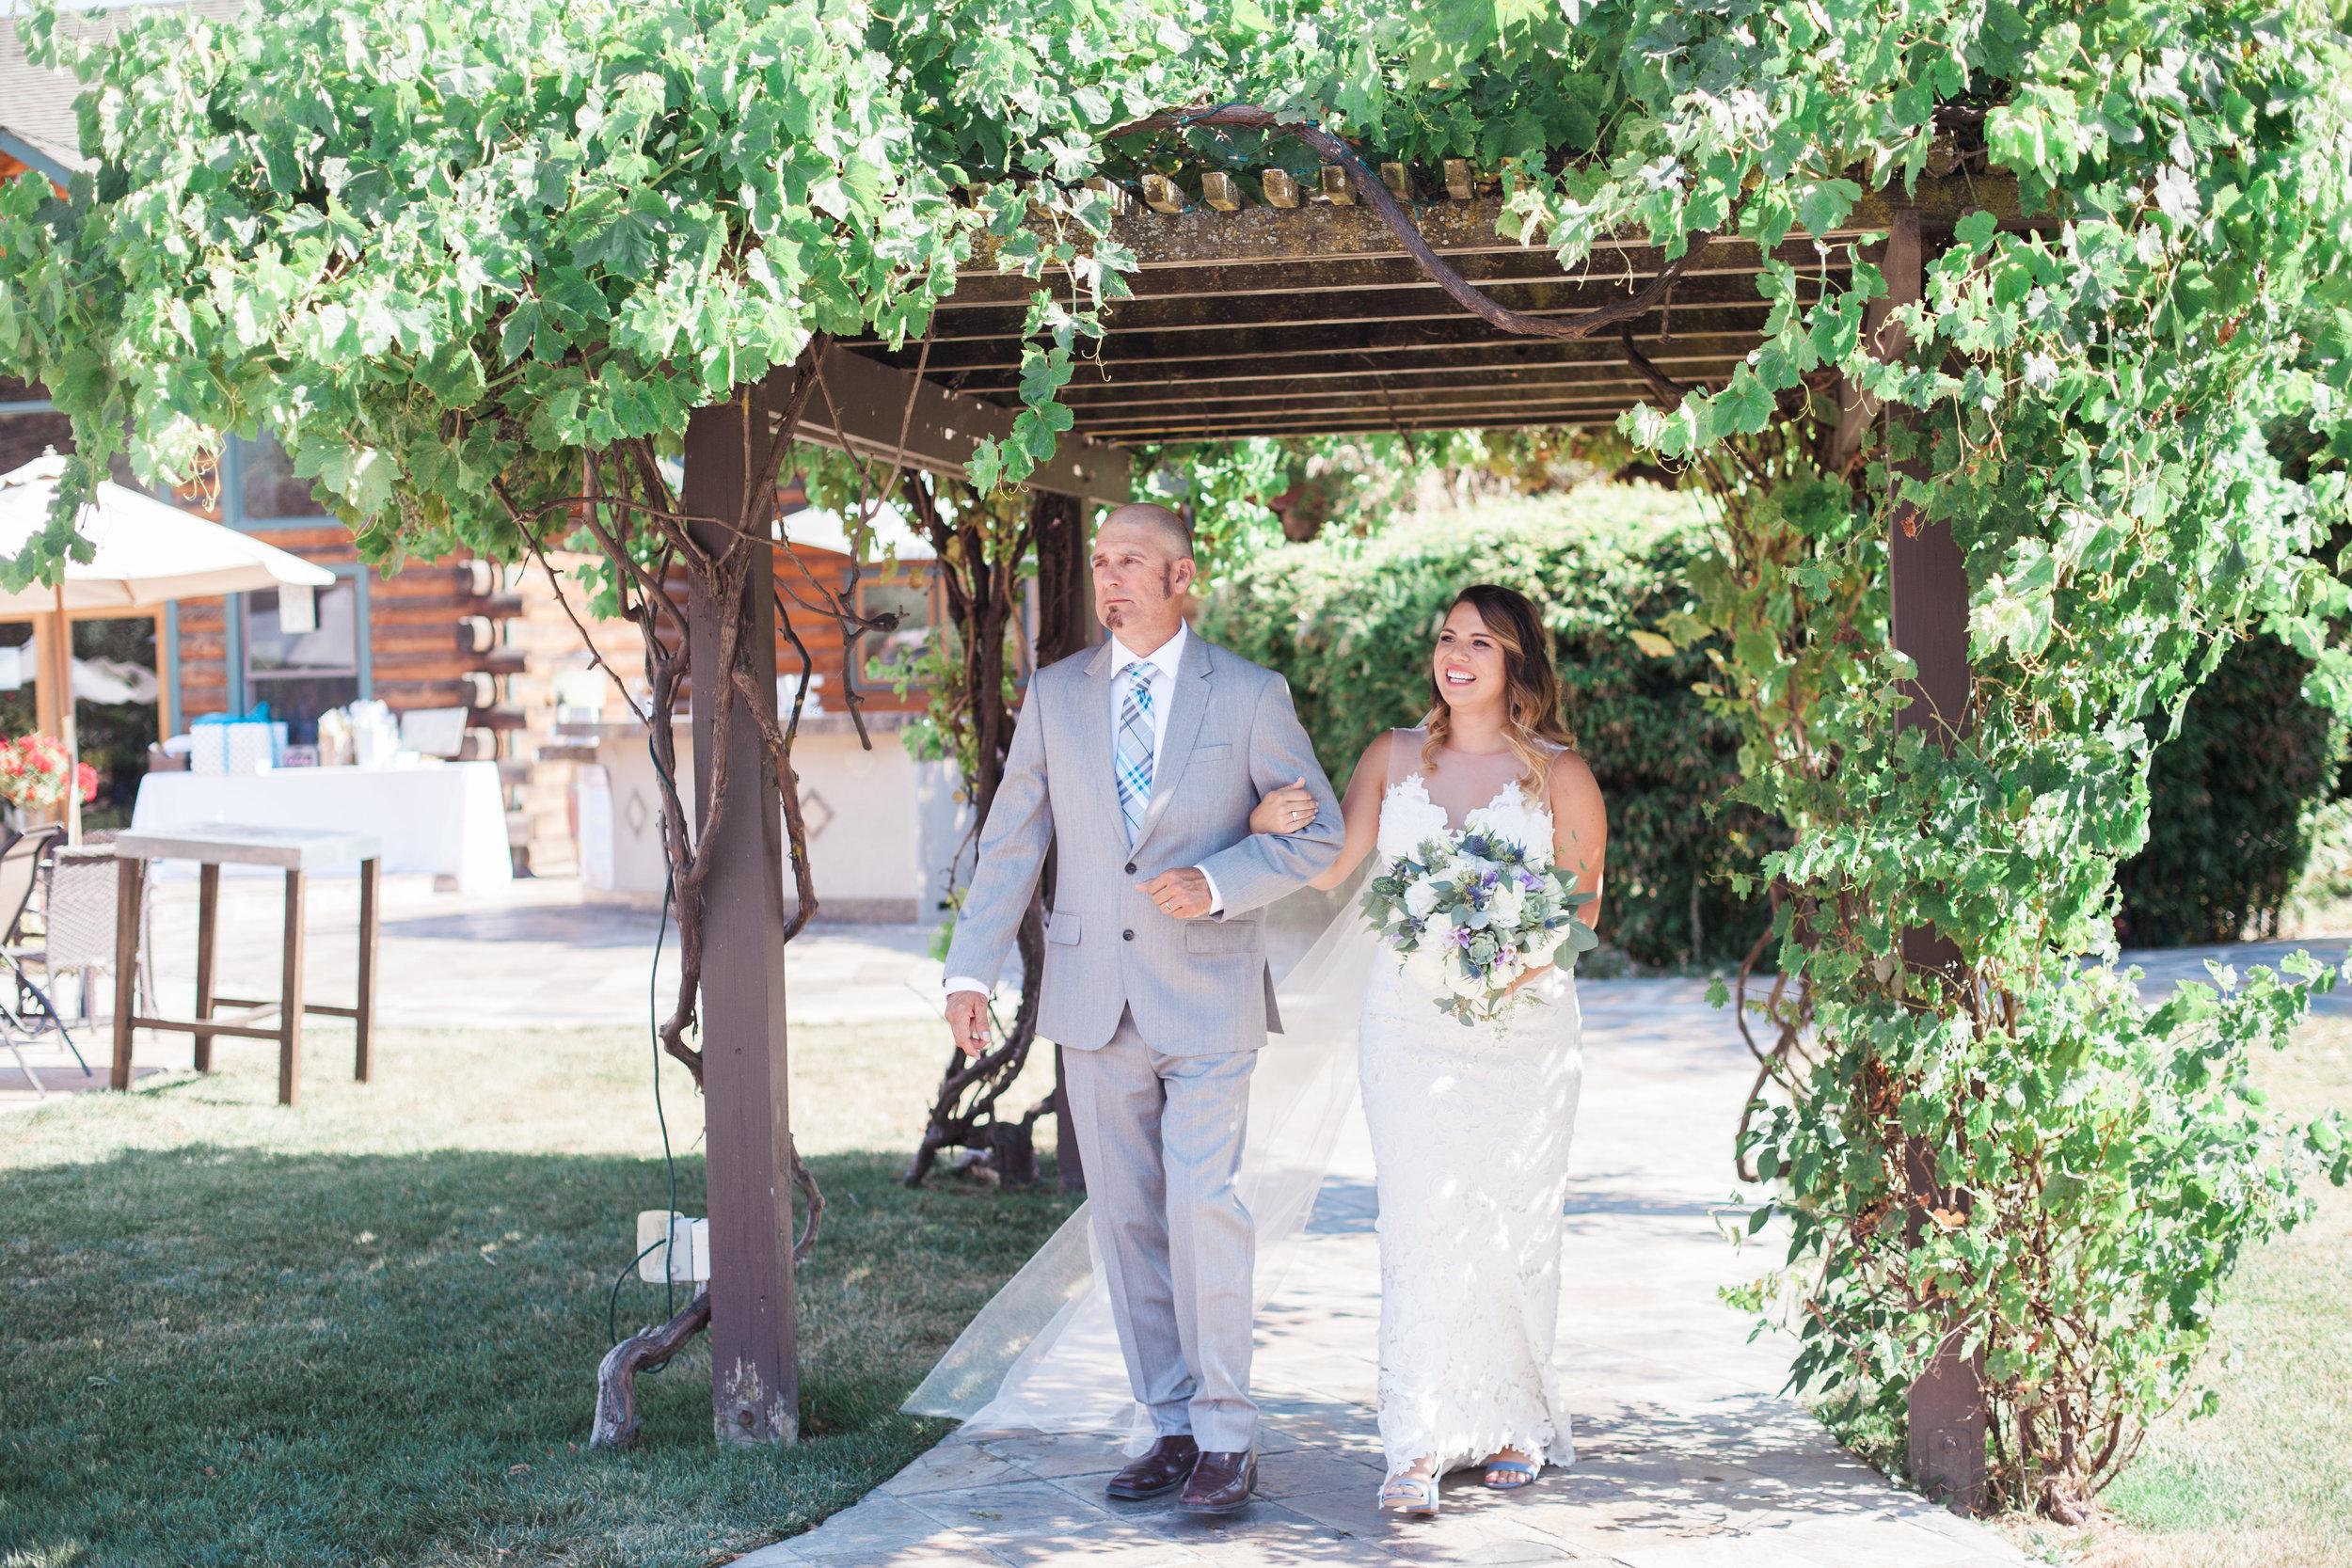 the-purple-orchid-resort-wedding-in-livermore-california-10.jpg